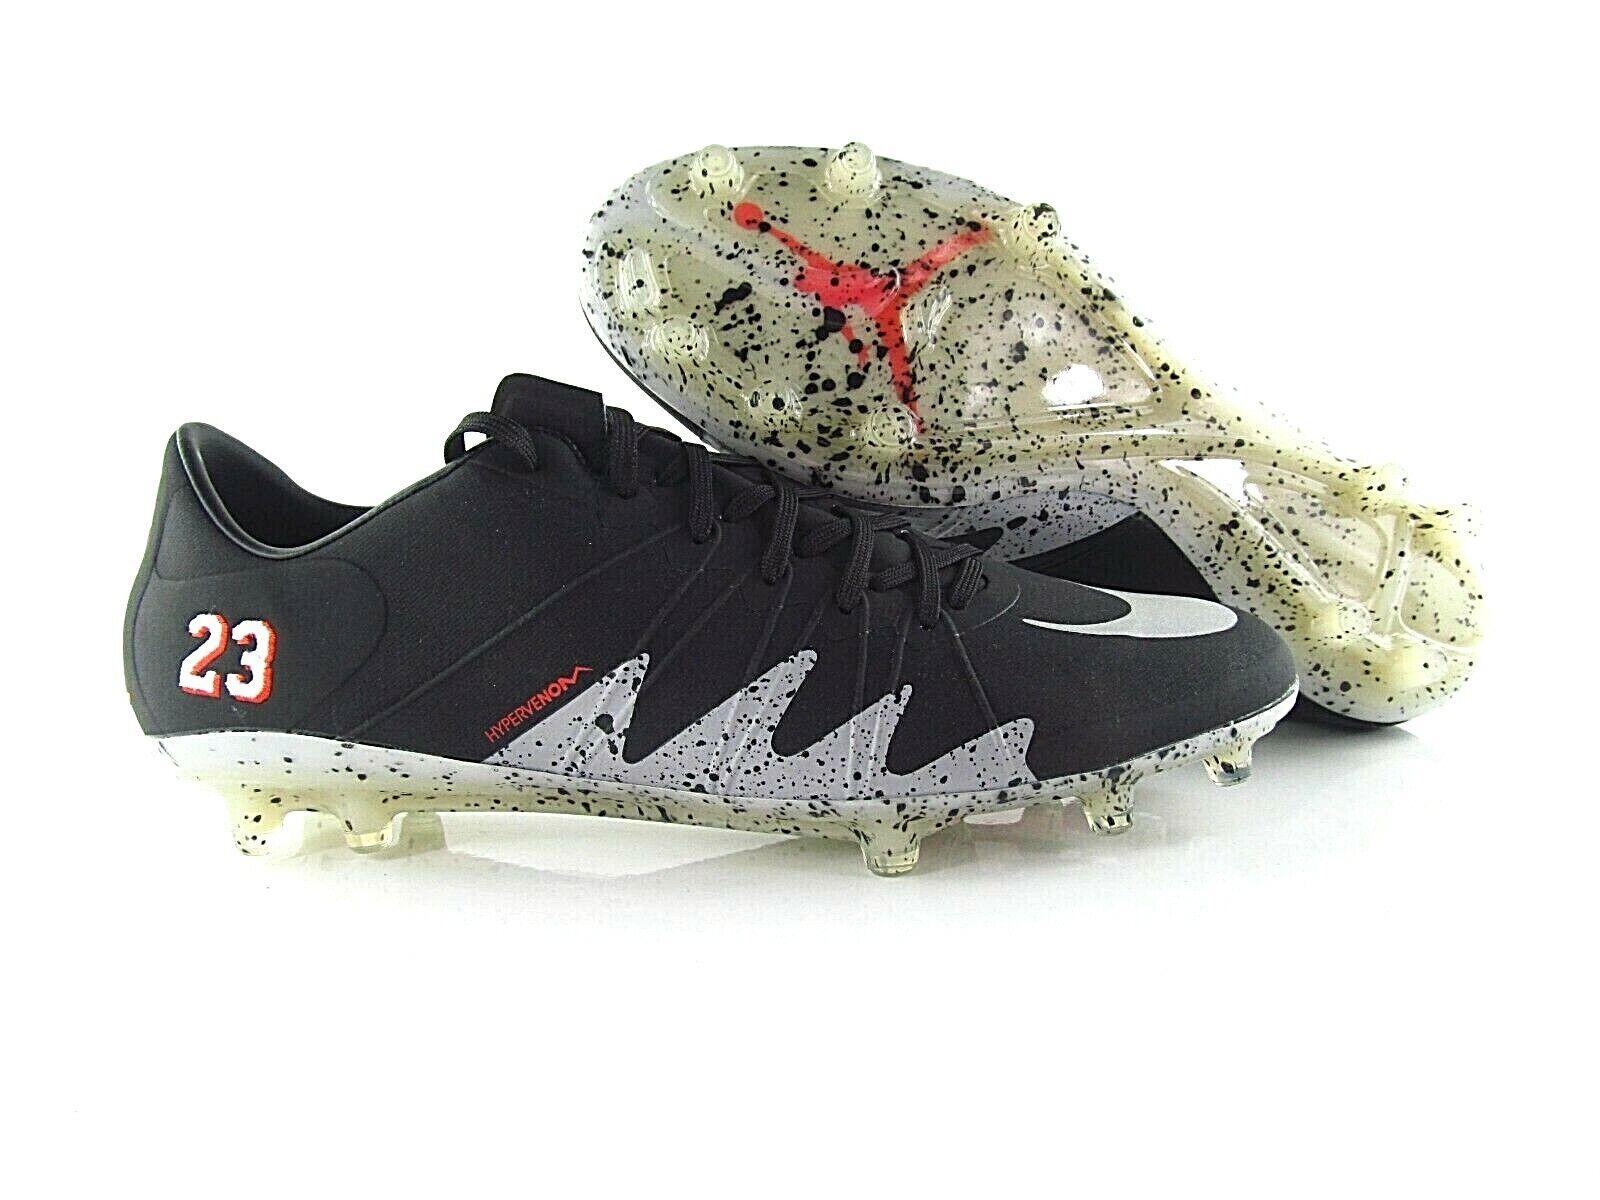 Nike hypervenom phinish NJR FG neymar x jordan acc 820122 006 us_12.5 eur_47